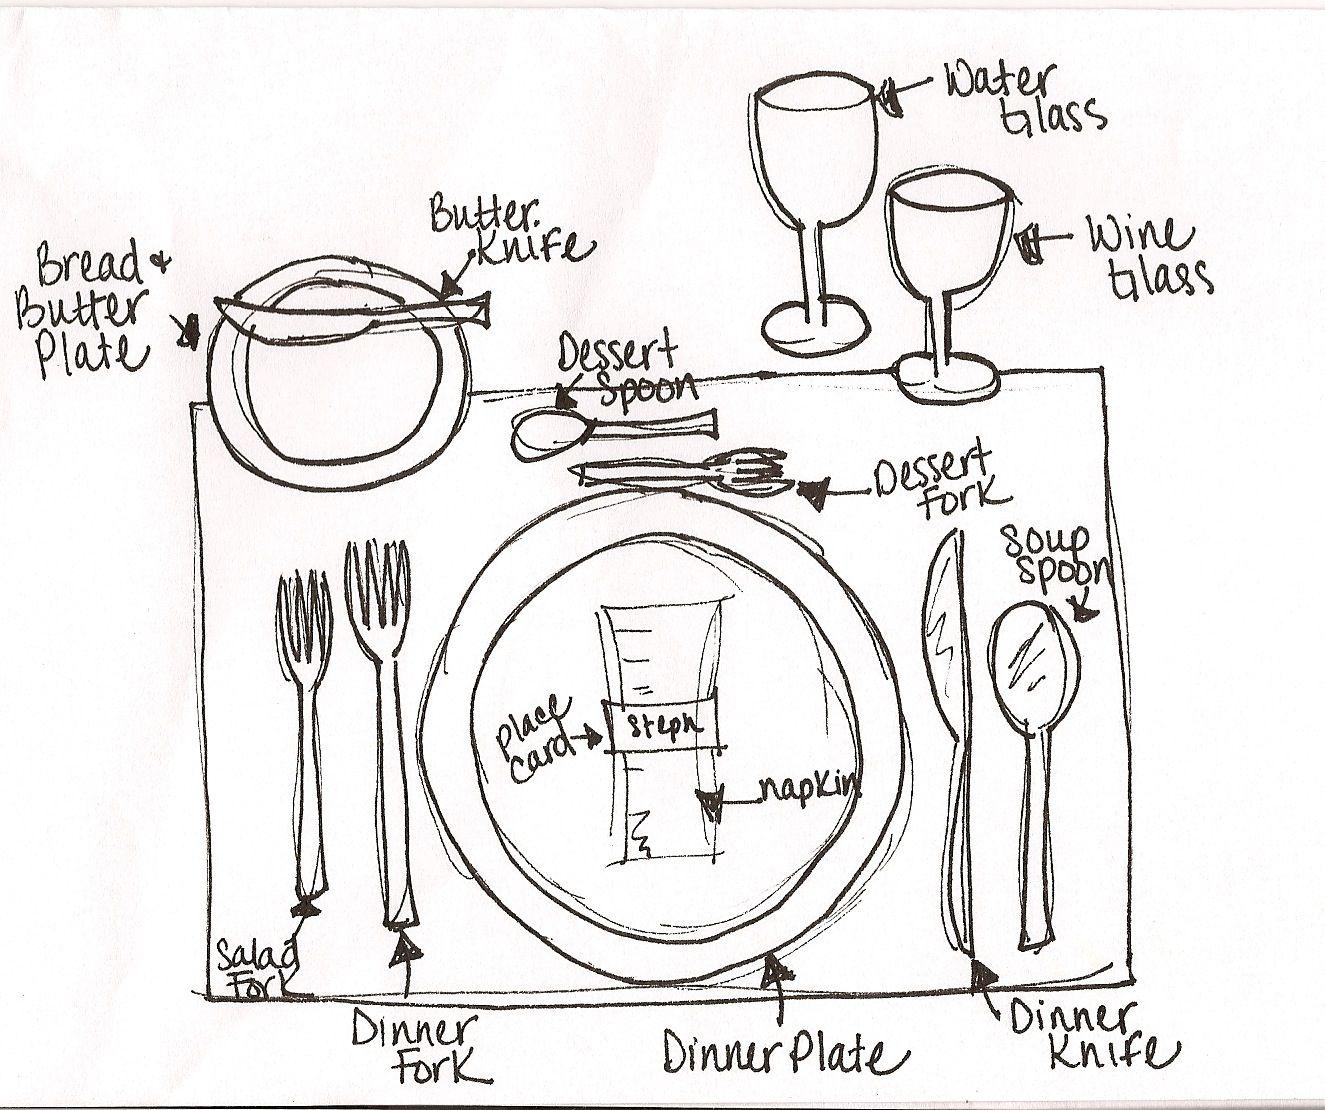 Formal dinner table setting etiquette - Prim And Proper Activ8 Camp Muscogee Moms Proper Table Settingsetting